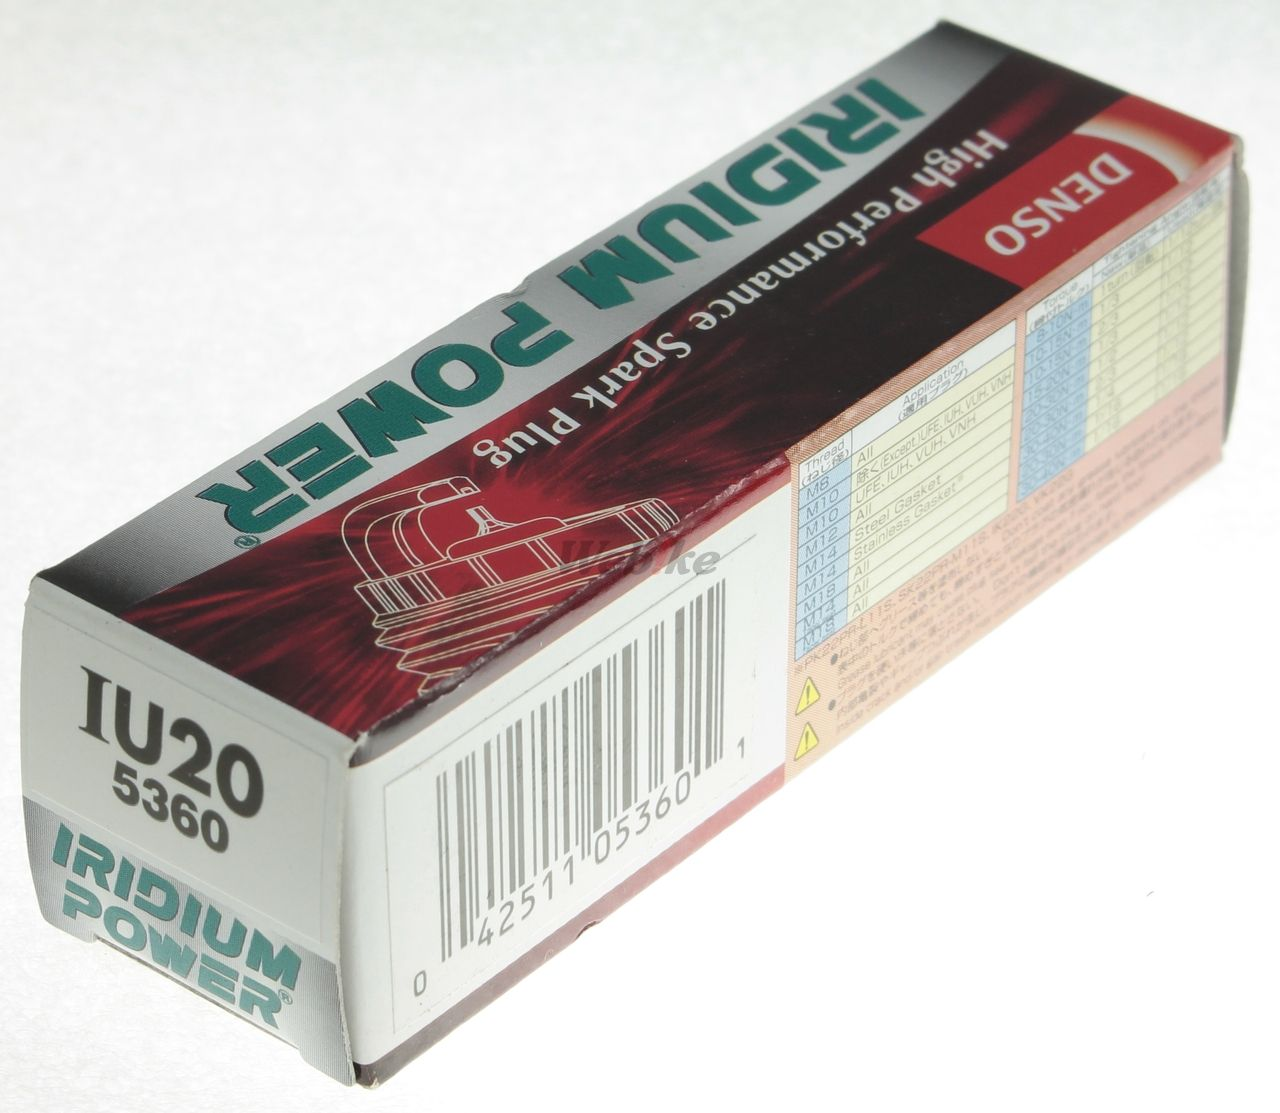 【DENSO】銥合金 火星塞 IU20 - 「Webike-摩托百貨」